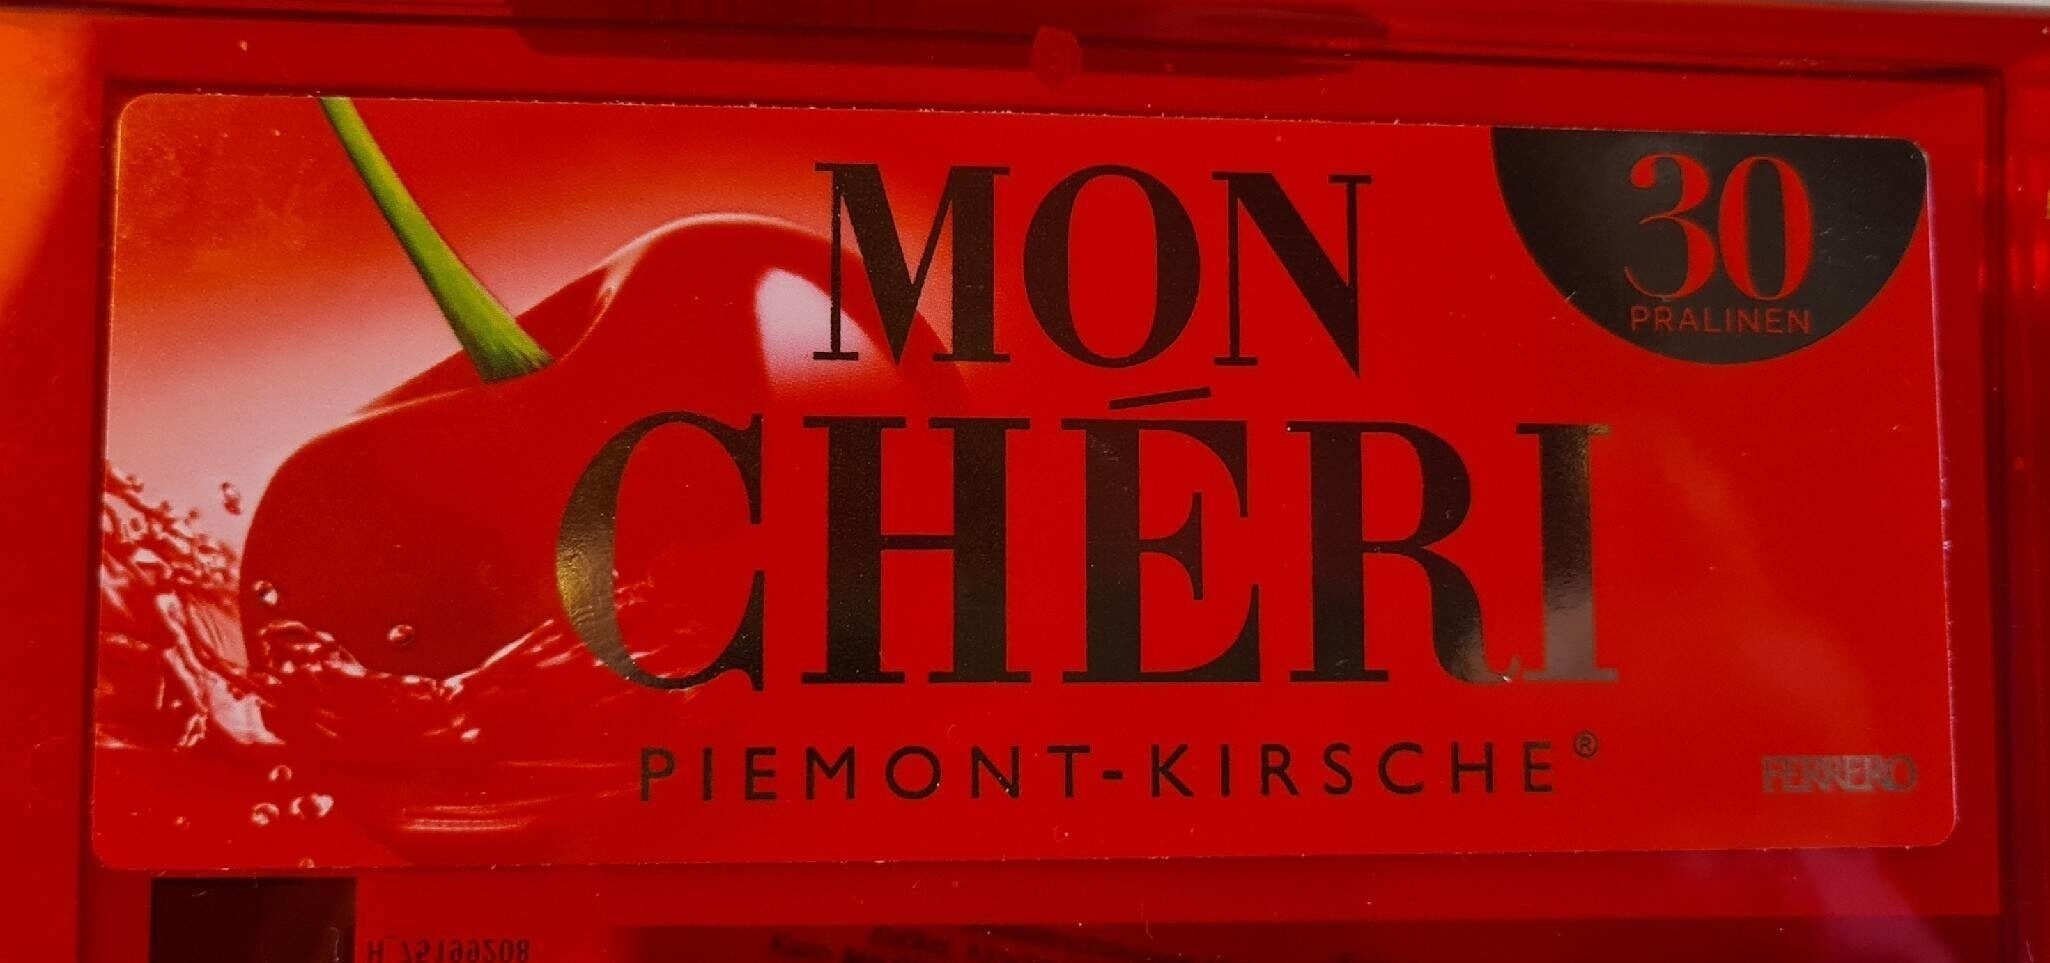 Mon CHÉRI PIEMONT-KIRSCHE - Prodotto - de